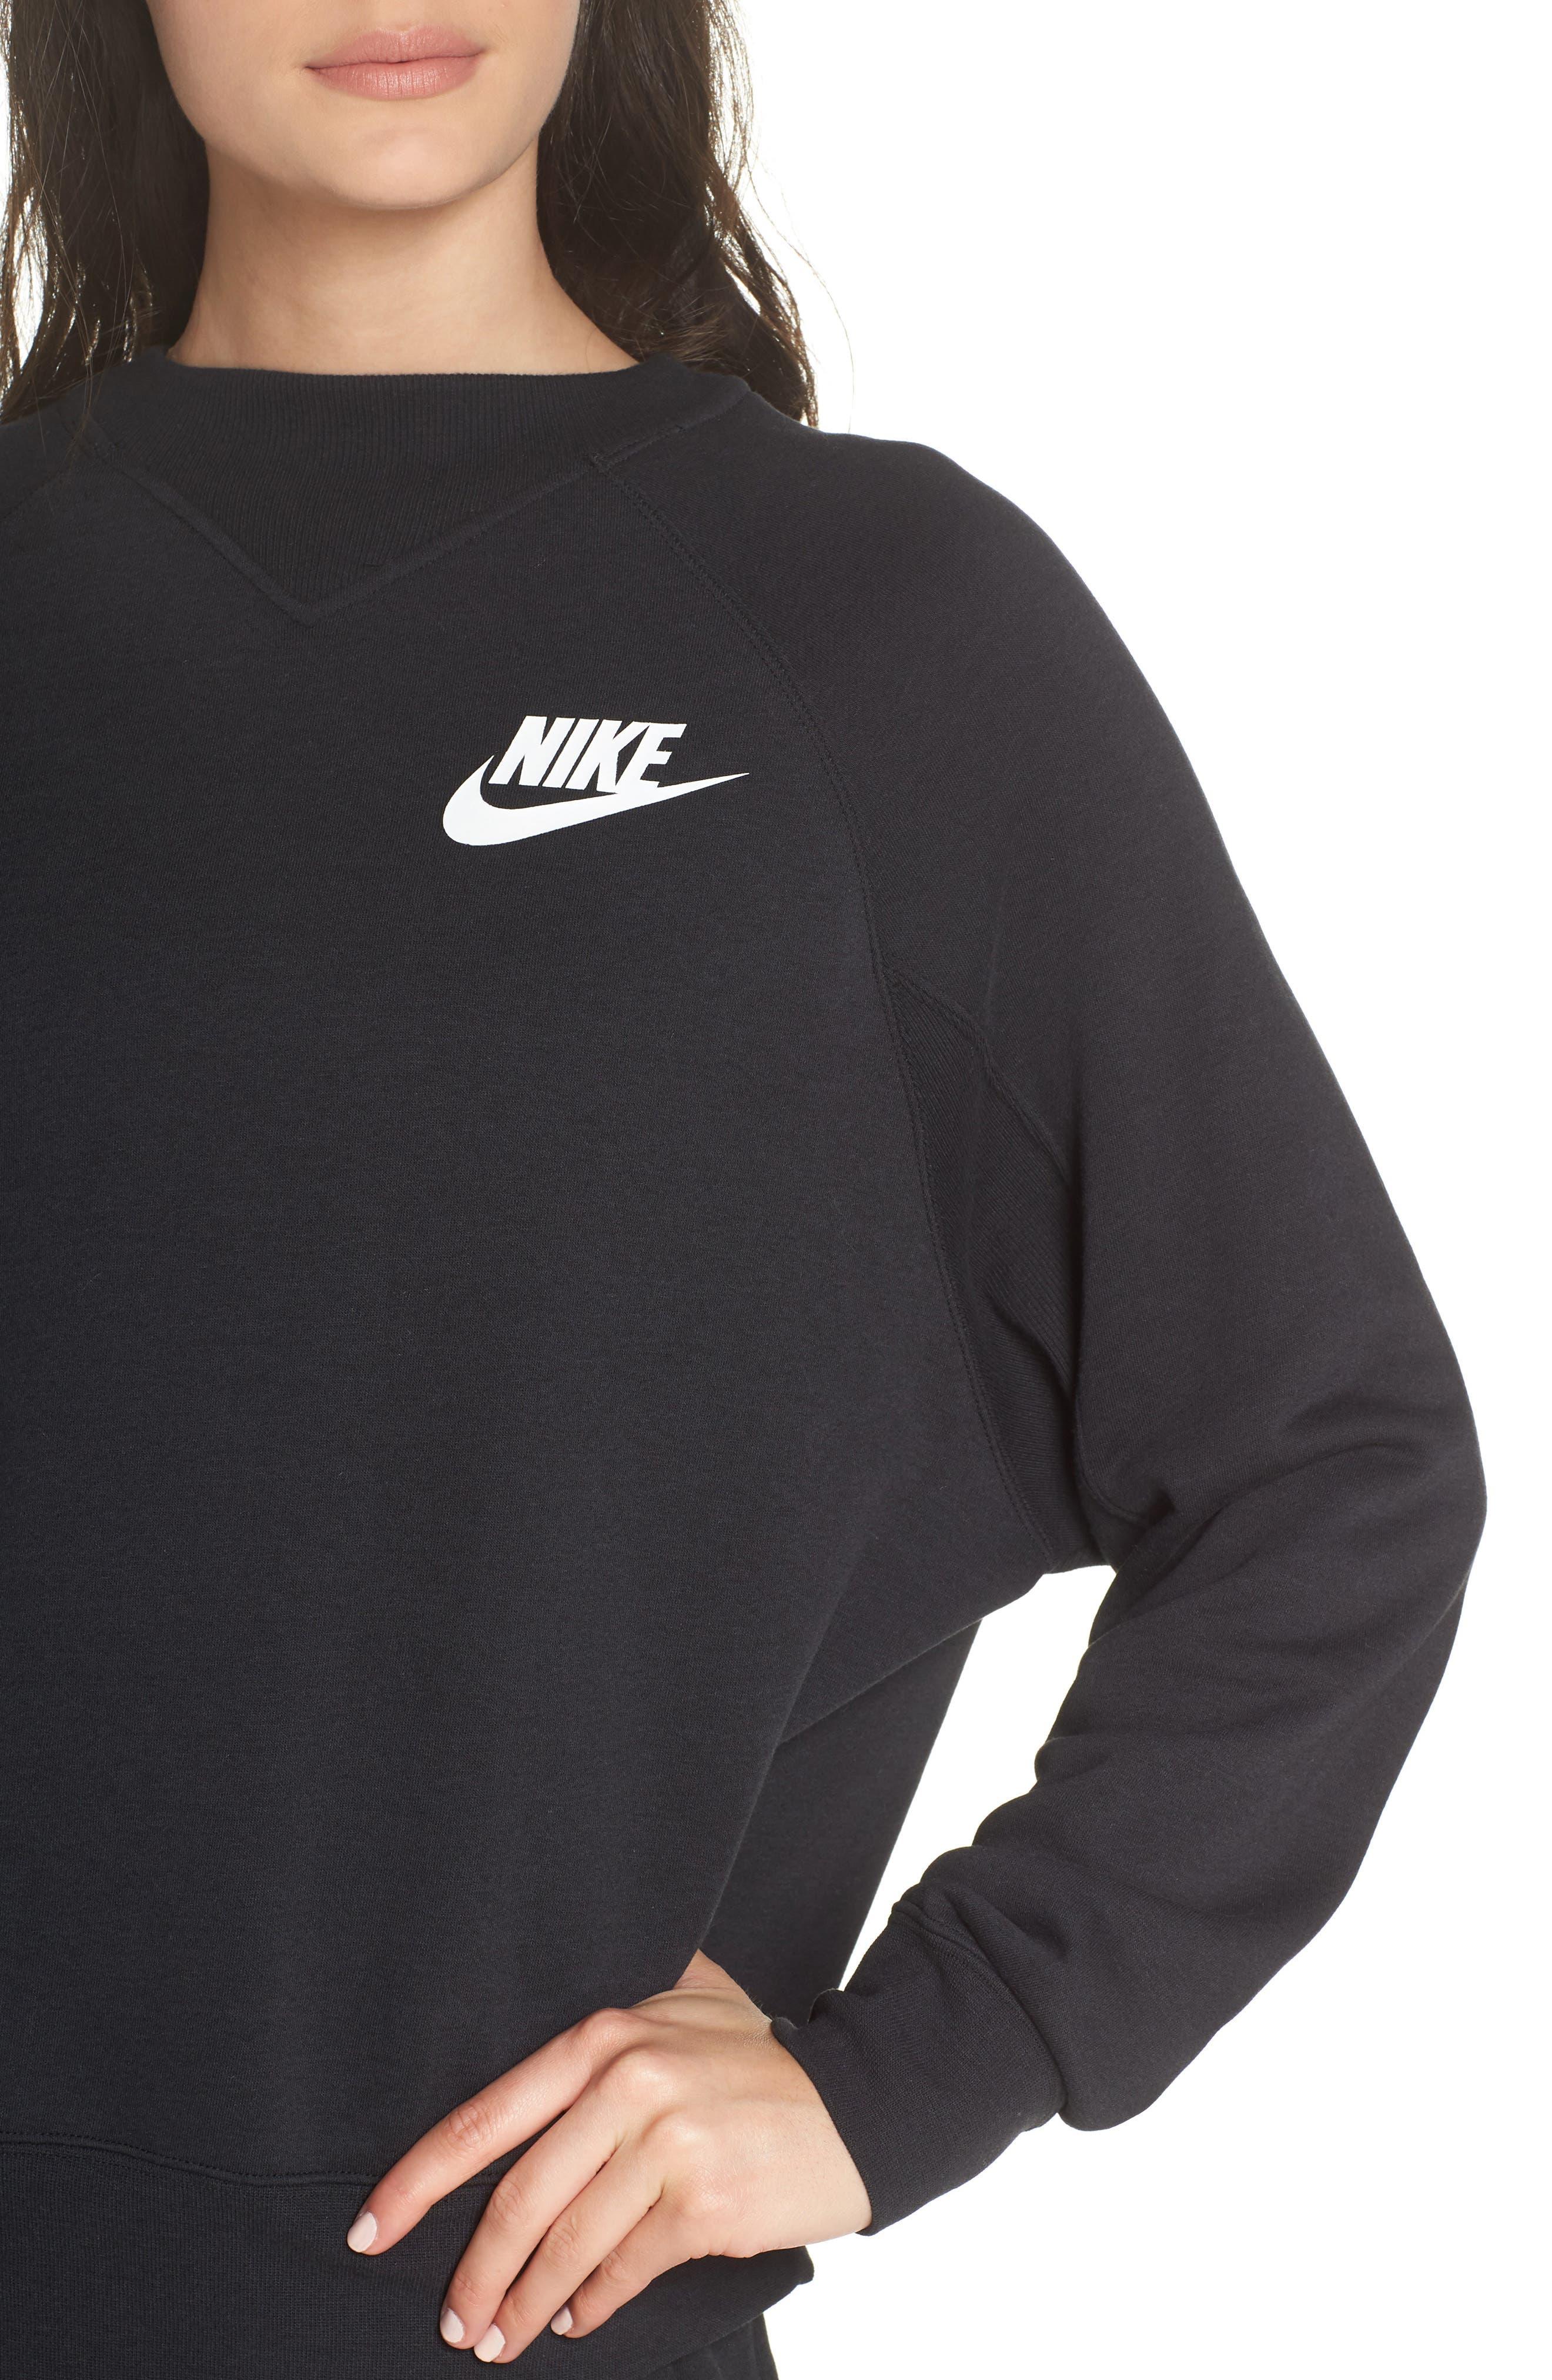 Sportswear Rally Sweatshirt,                             Alternate thumbnail 4, color,                             Black/ White